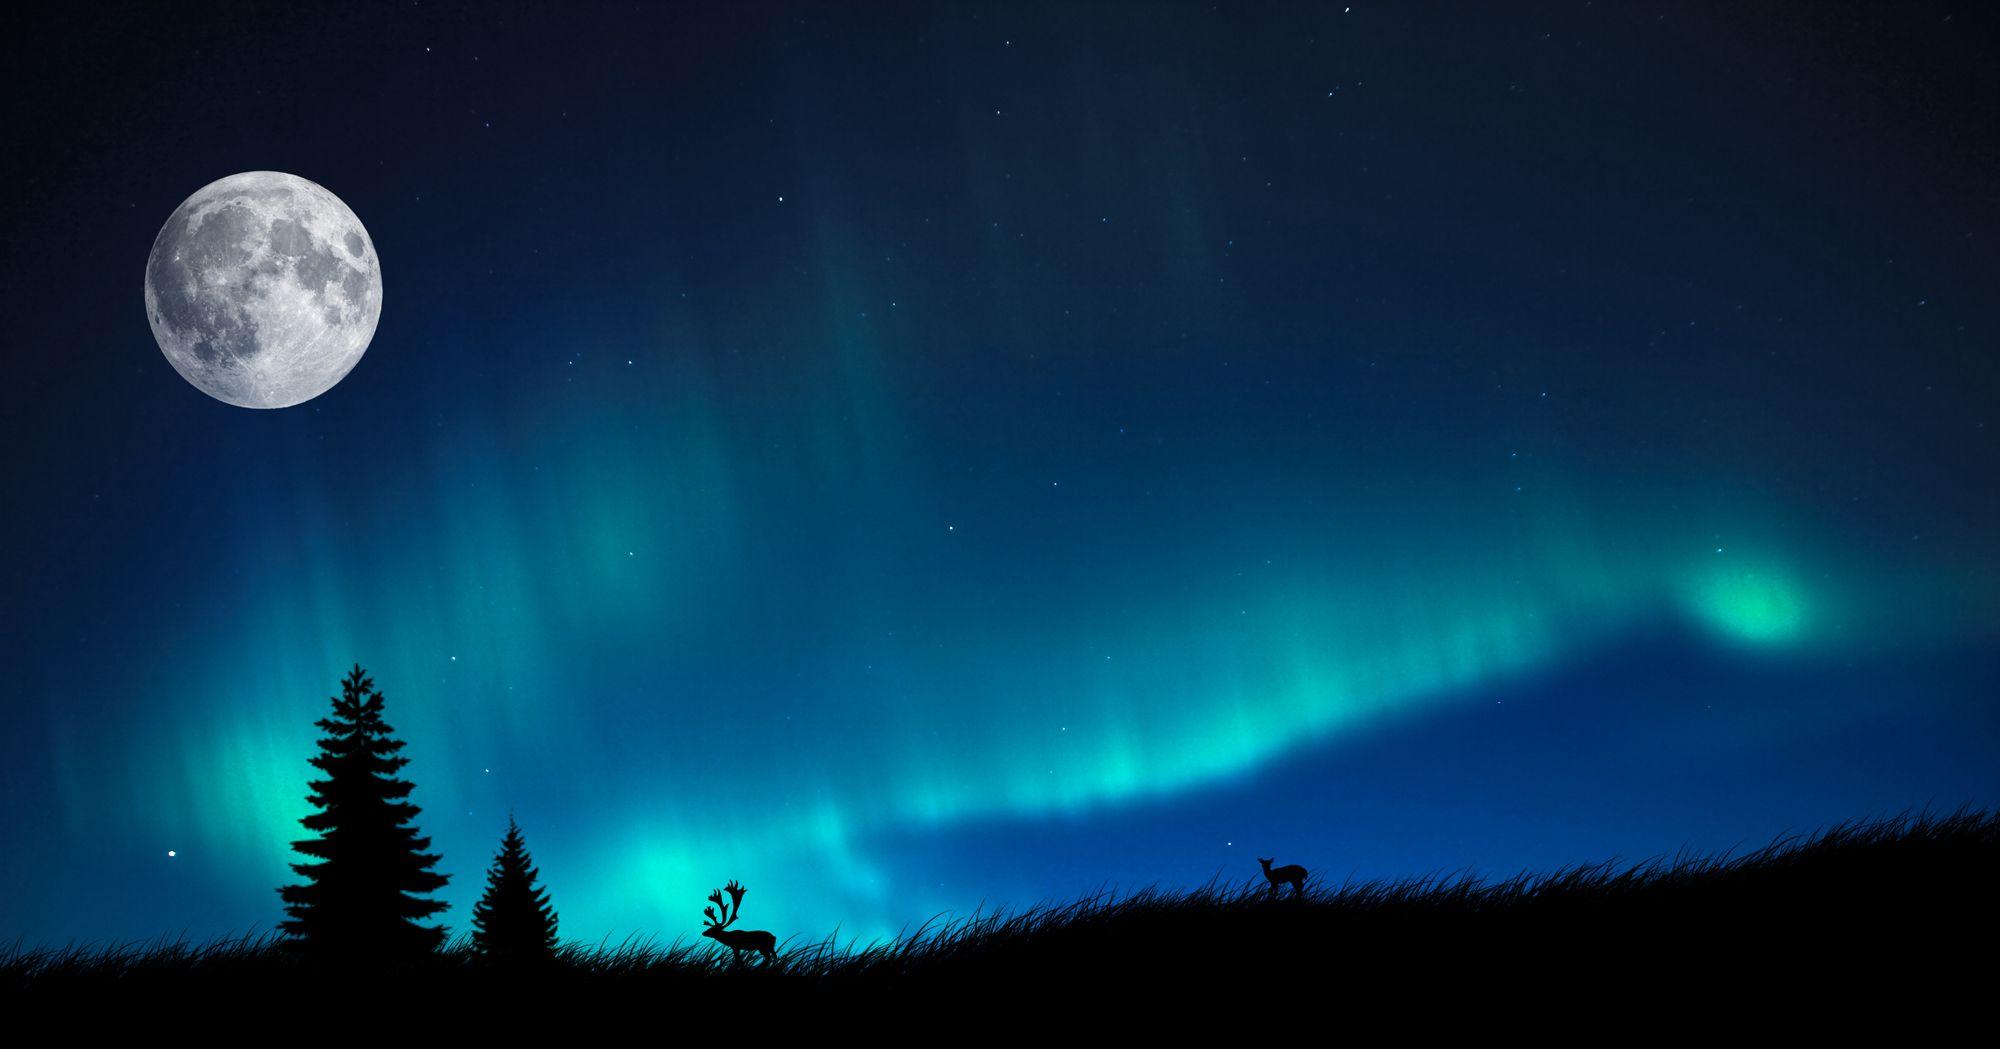 Aurora Borealis Wallpaper 5079 1680x1050 Px Hdwallsource Com Northern Lights Wallpaper Northen Lights Northern Lights